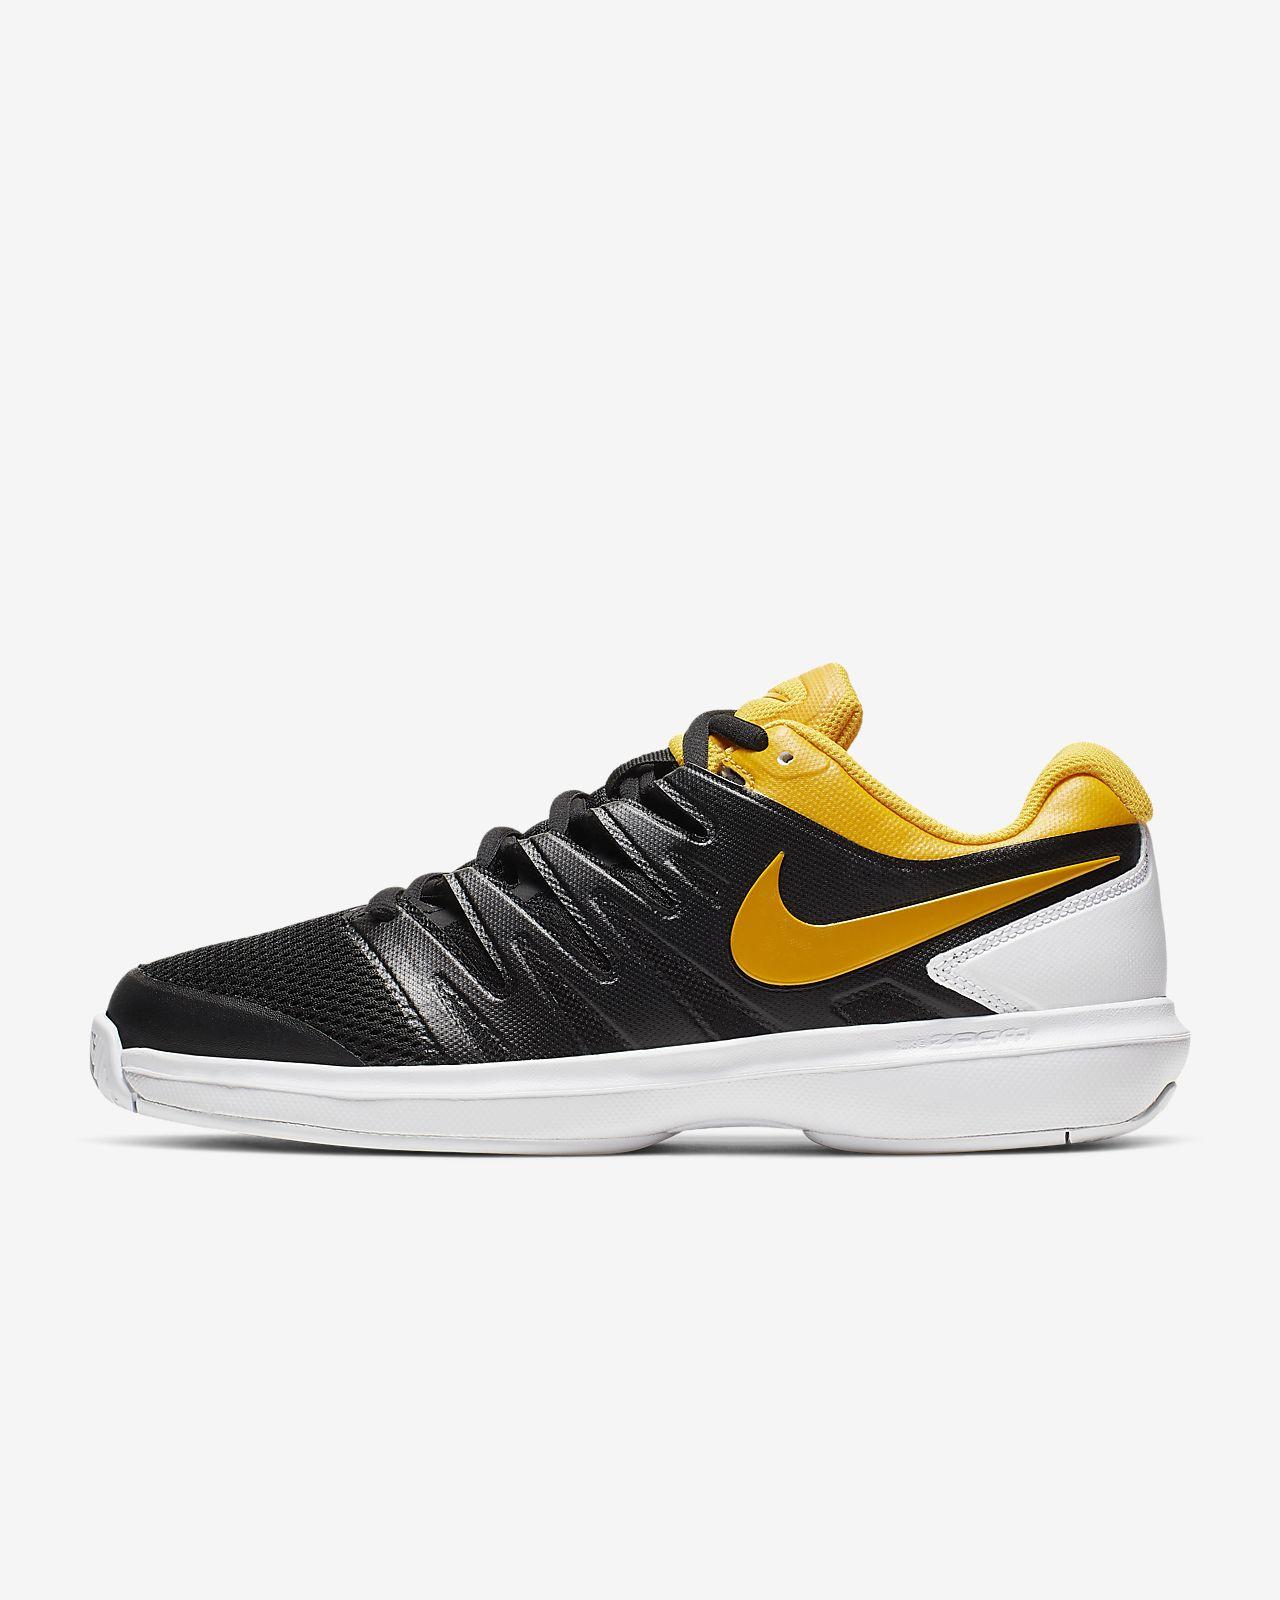 De Hombre Para Air Cancha Dura Nikecourt Tenis Zoom Calzado Prestige 8mNynvw0O